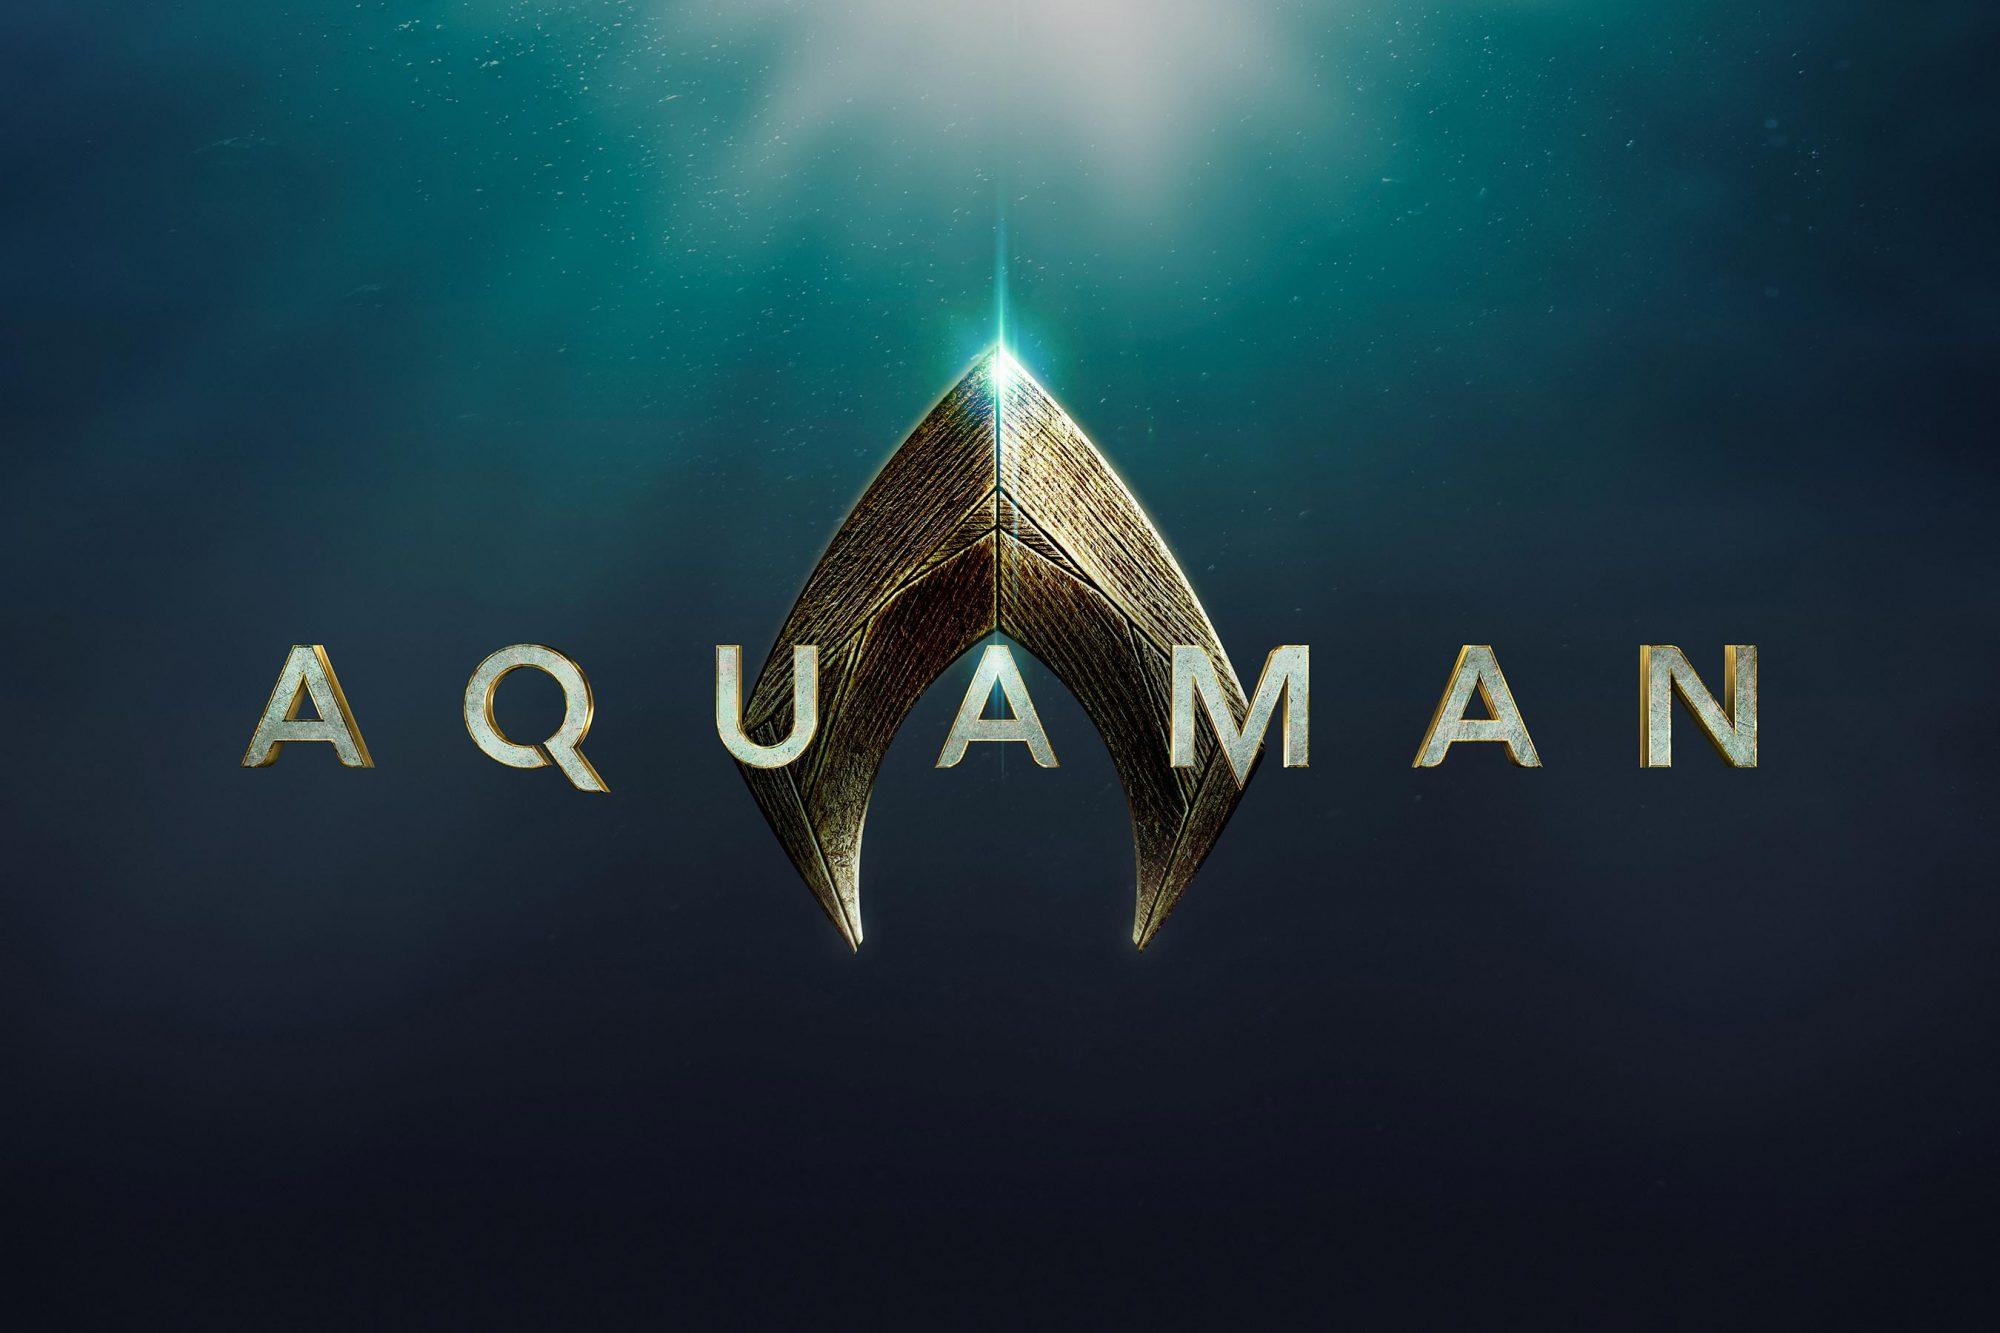 Aquaman Title Card CR: Warner Bros.